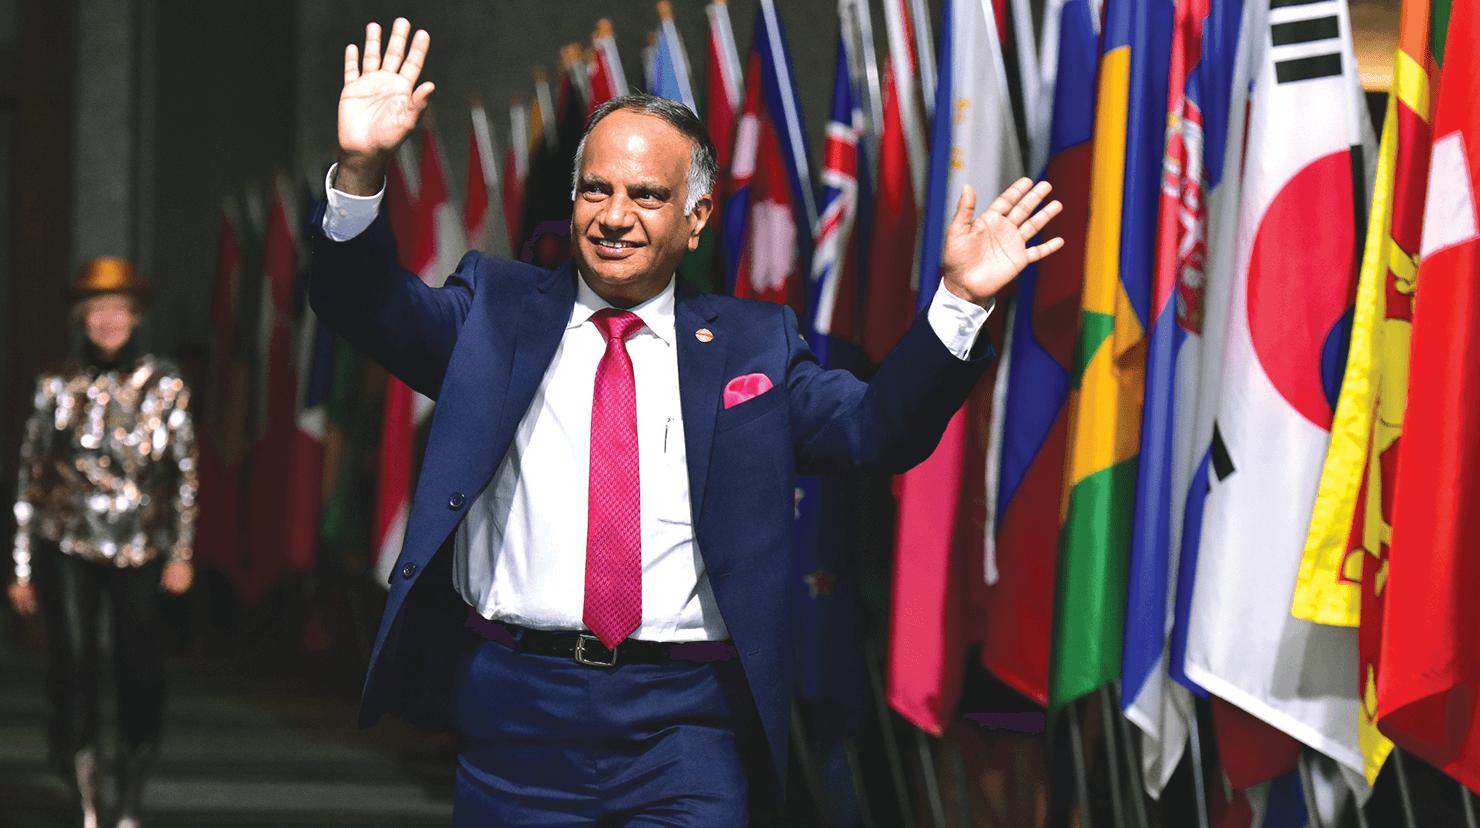 Deepak Menon is Toastmasters' 2019-2020 International President.